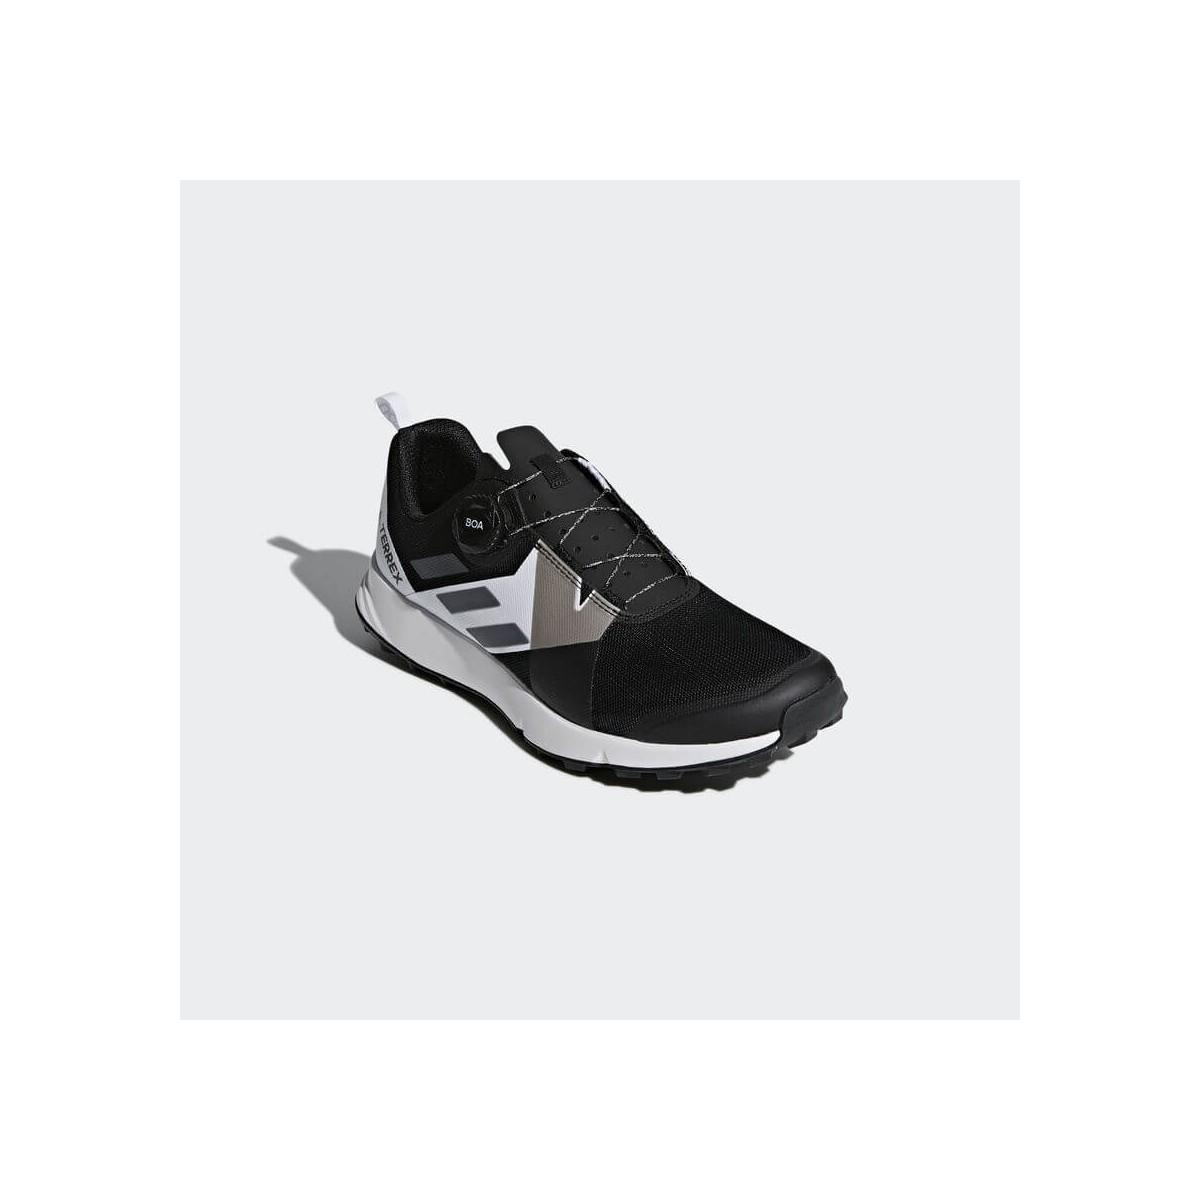 bolígrafo Crónico Variante  Fitness, running y yoga Adidas Creator 365 mochila negro blanco omlab.pt